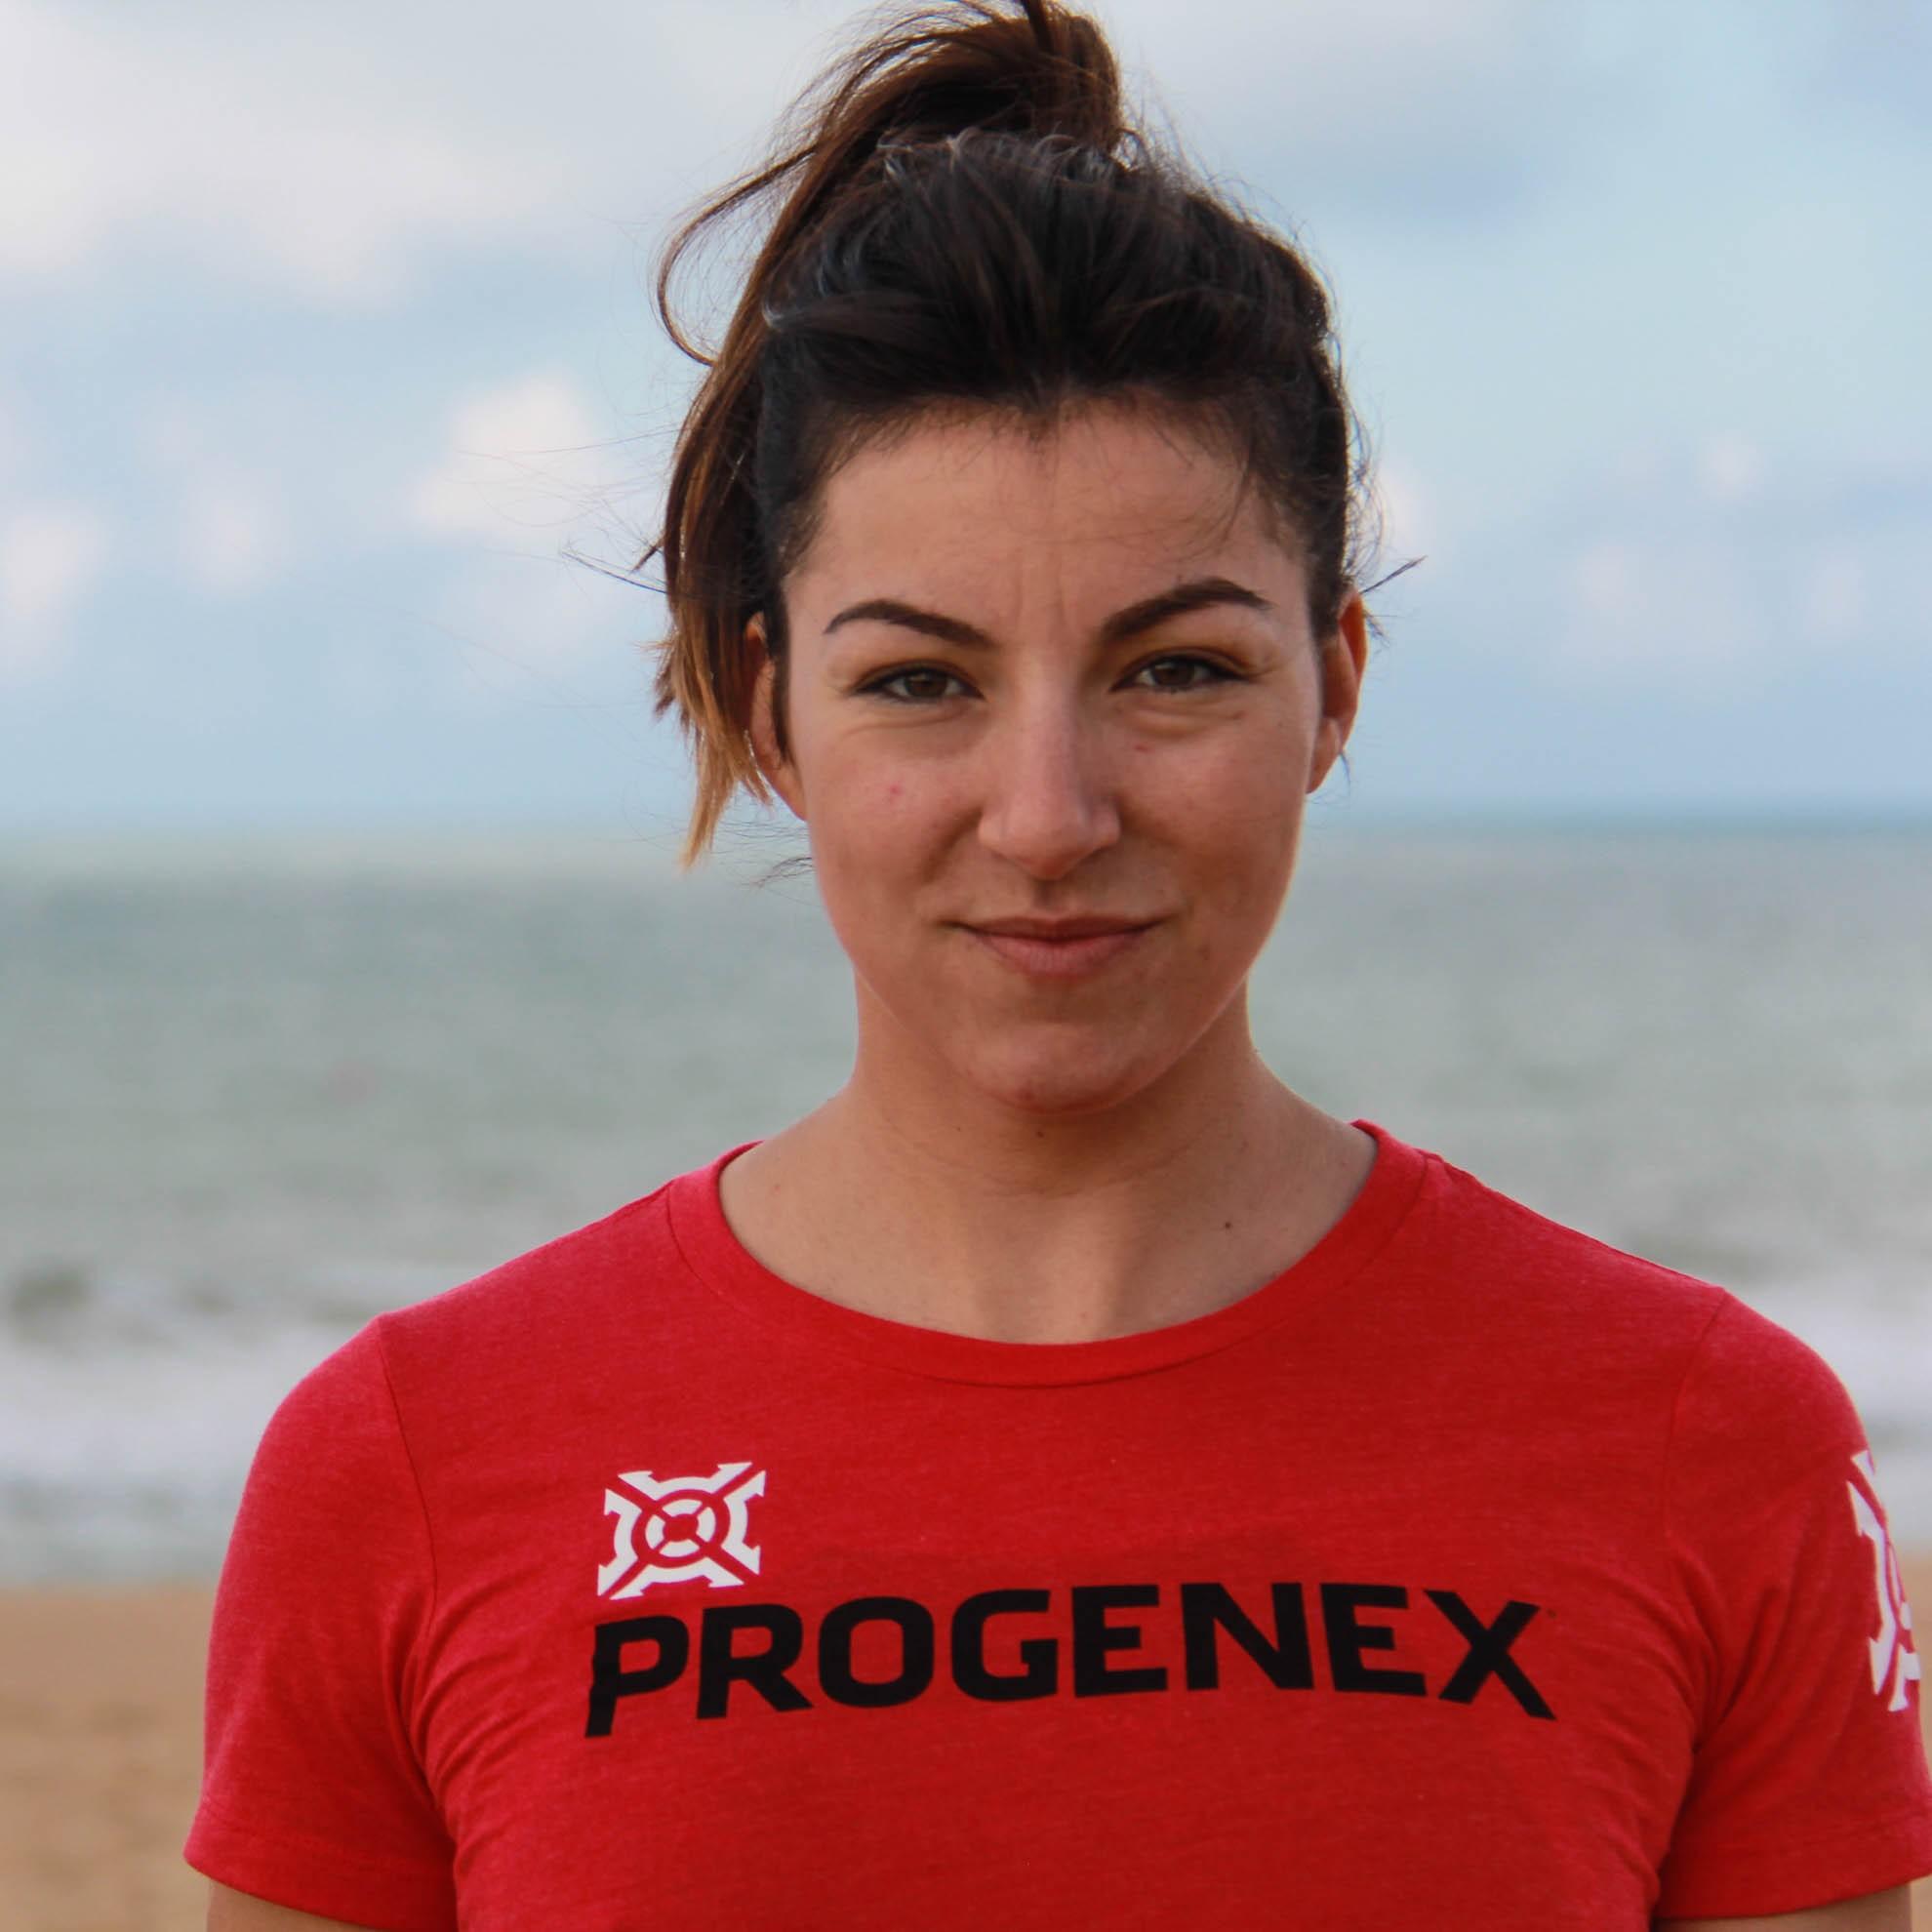 Progenex Woman's WOD T-Shirt front